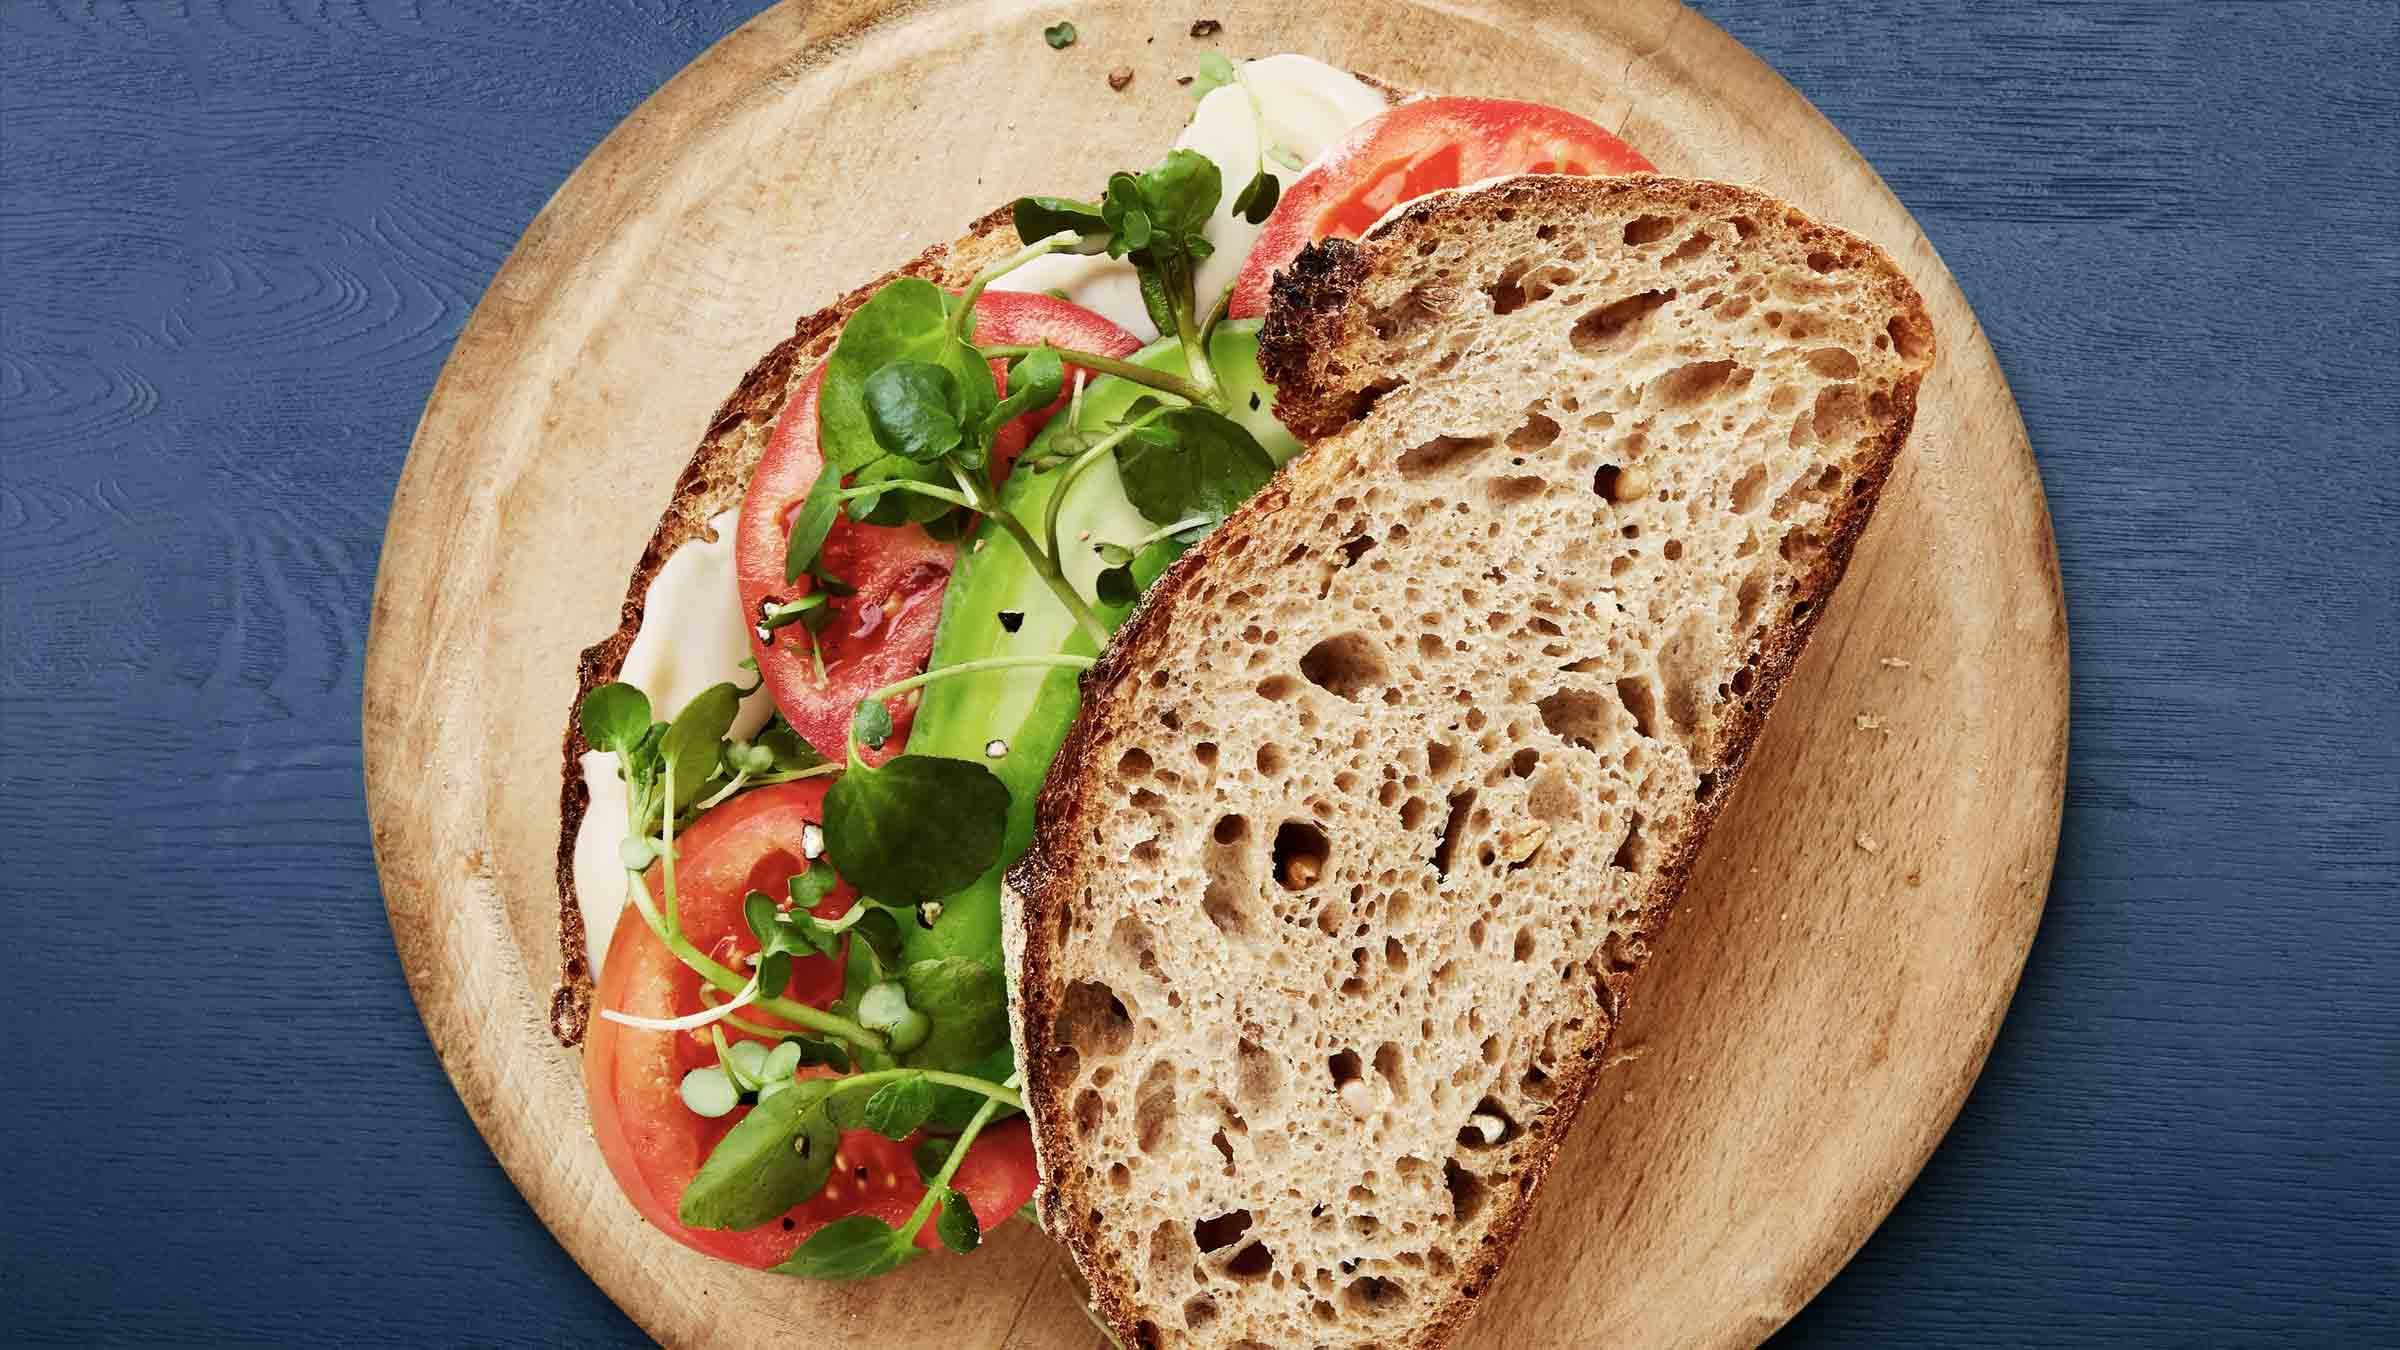 Avocado, Tomato, & Watercress Sandwich Recipe